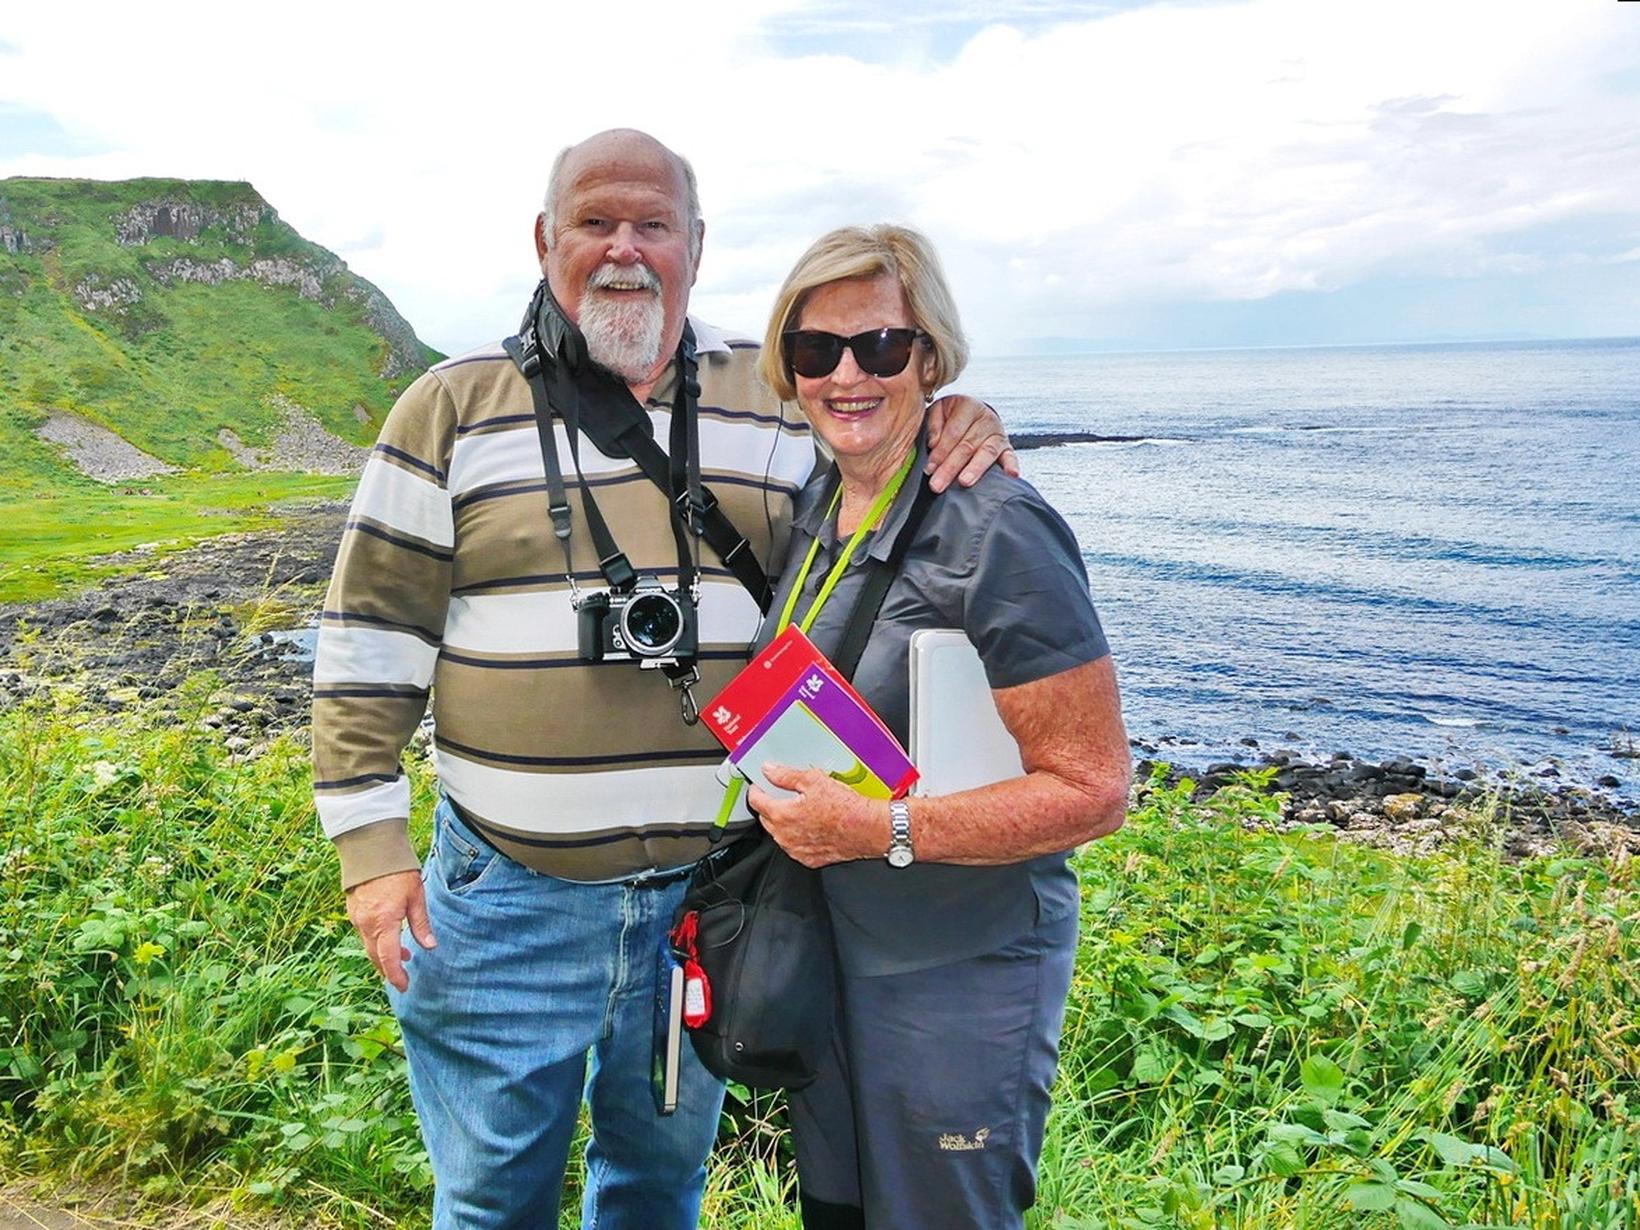 Maggie & Philip from Brisbane, Queensland, Australia